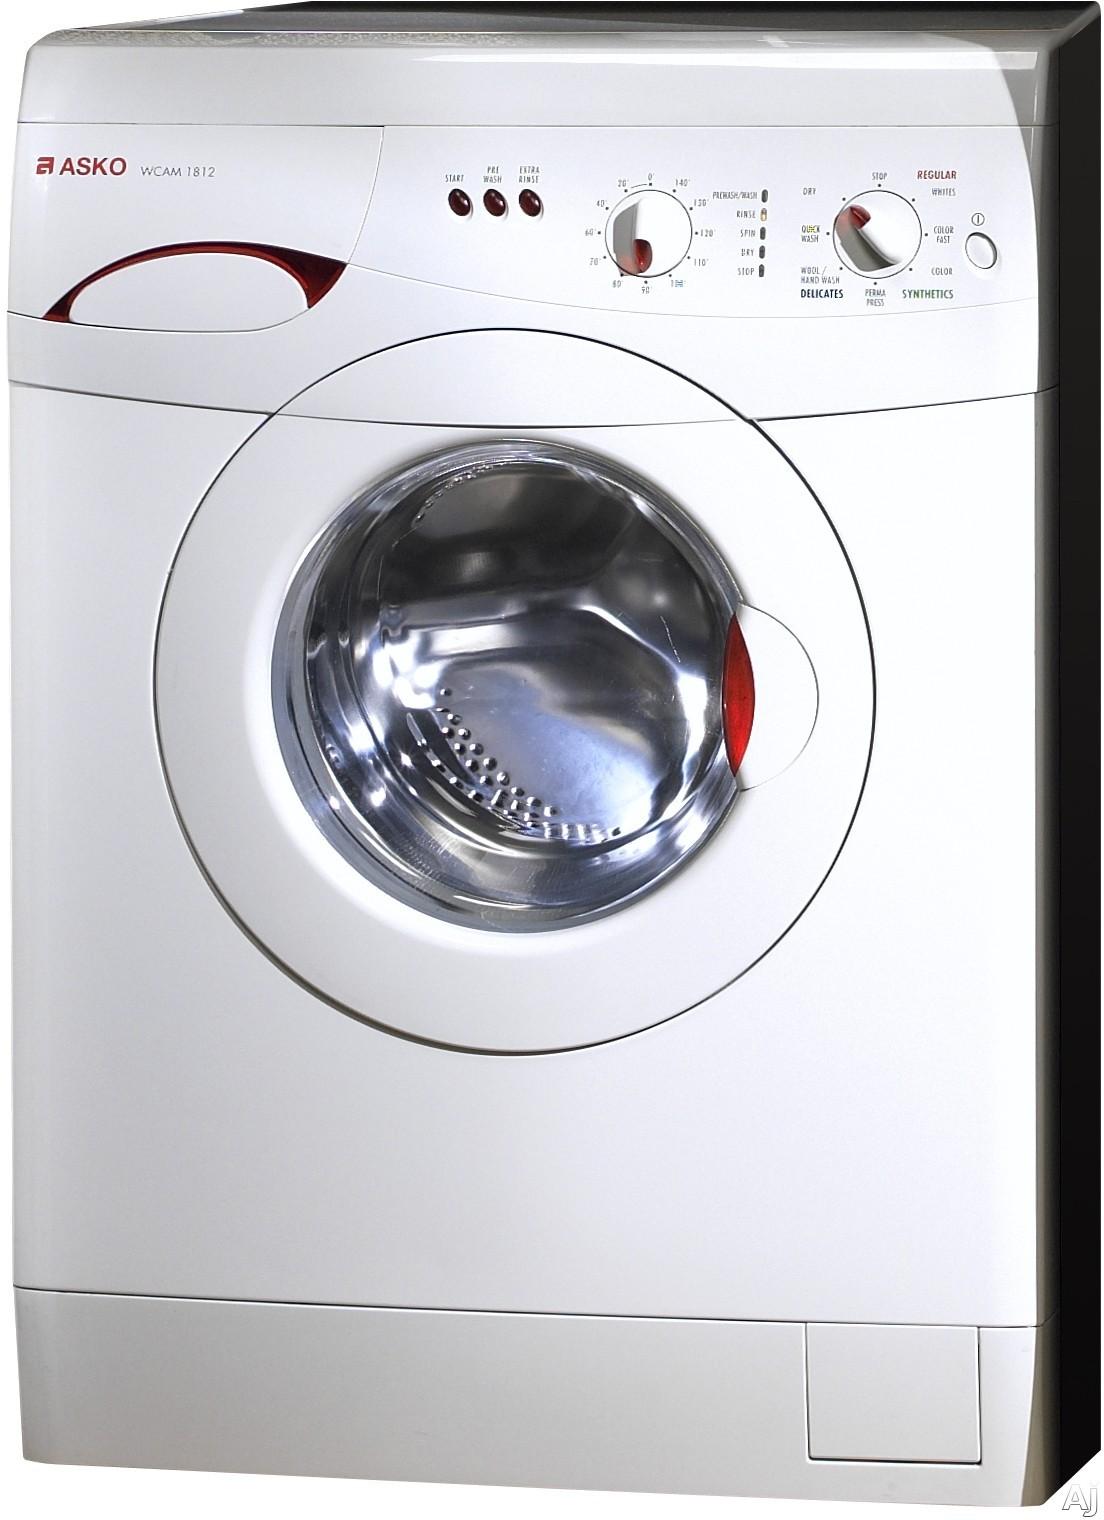 how to cancel a program on an asko washing machine